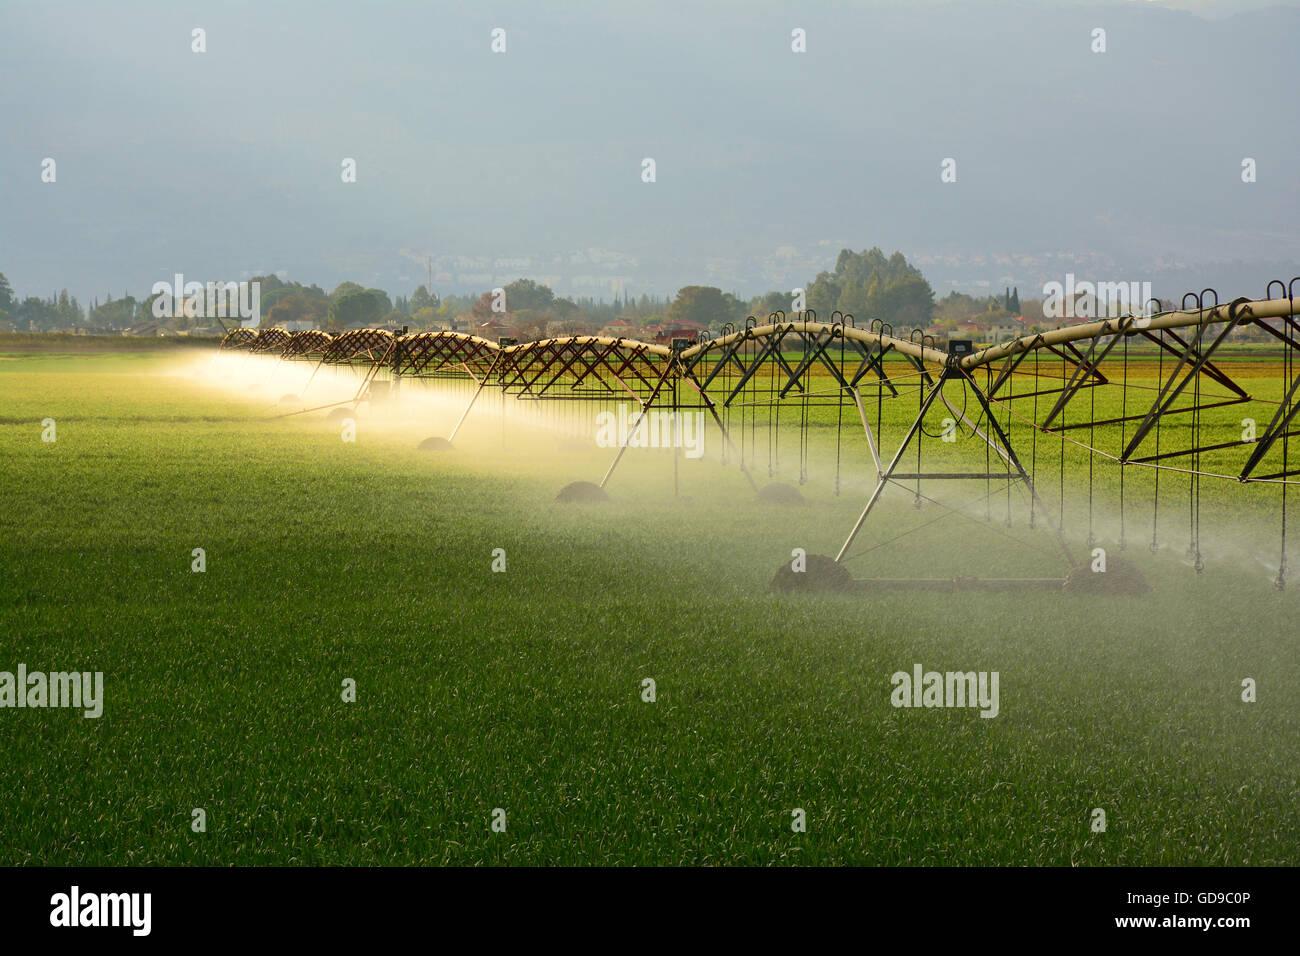 Acqua irrigua , Agricoltura Immagini Stock